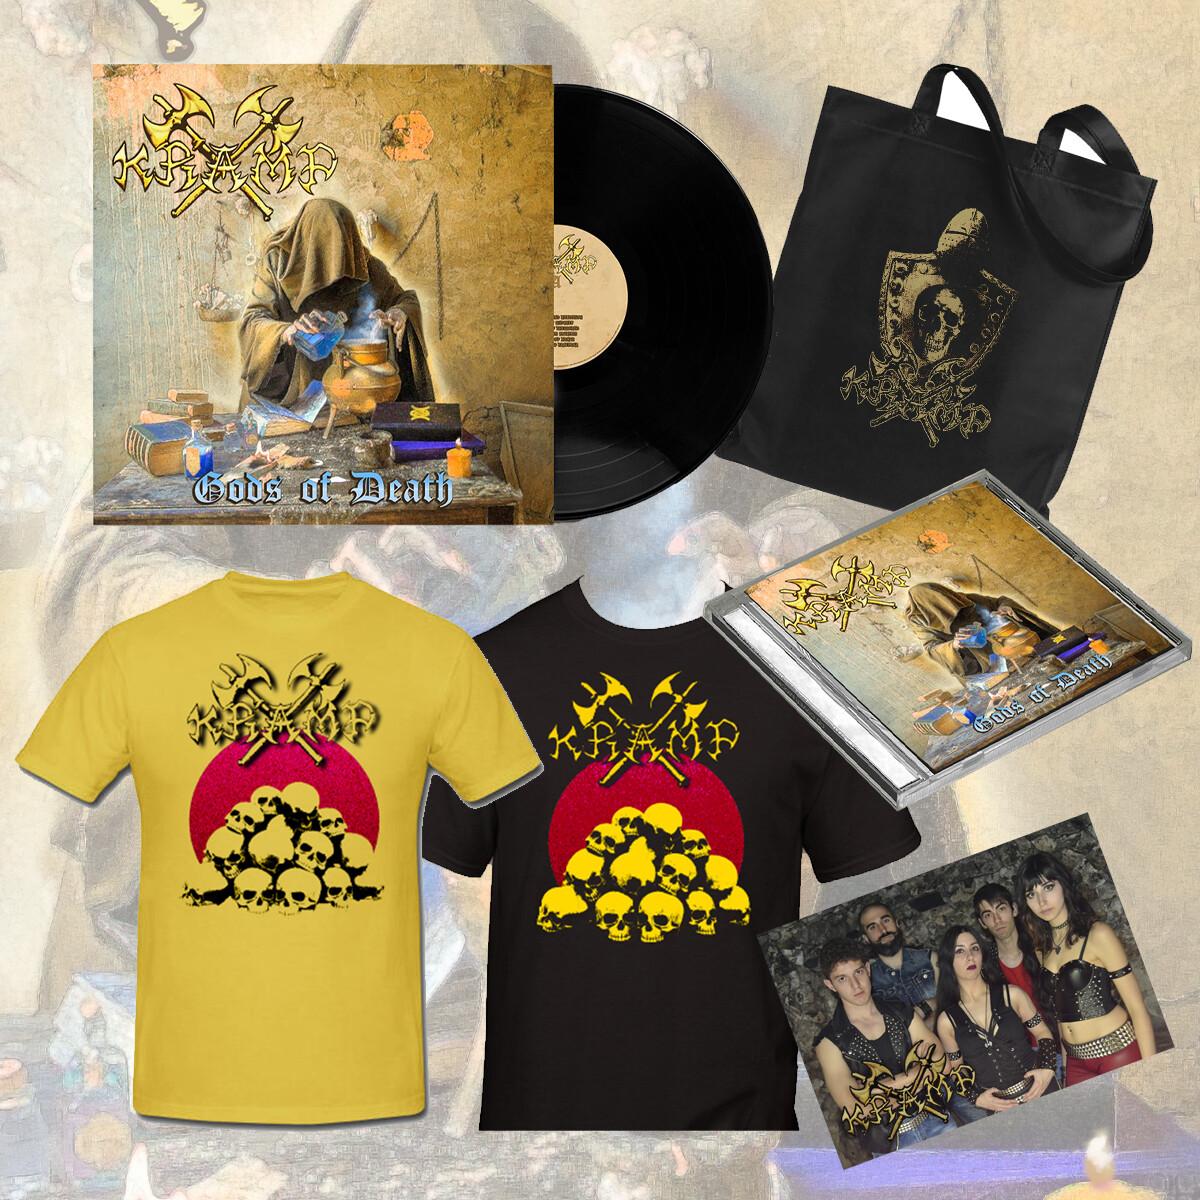 GET THEM ALL - BUNDLE (Vinyl + CD + T-shirt + Tote Bag